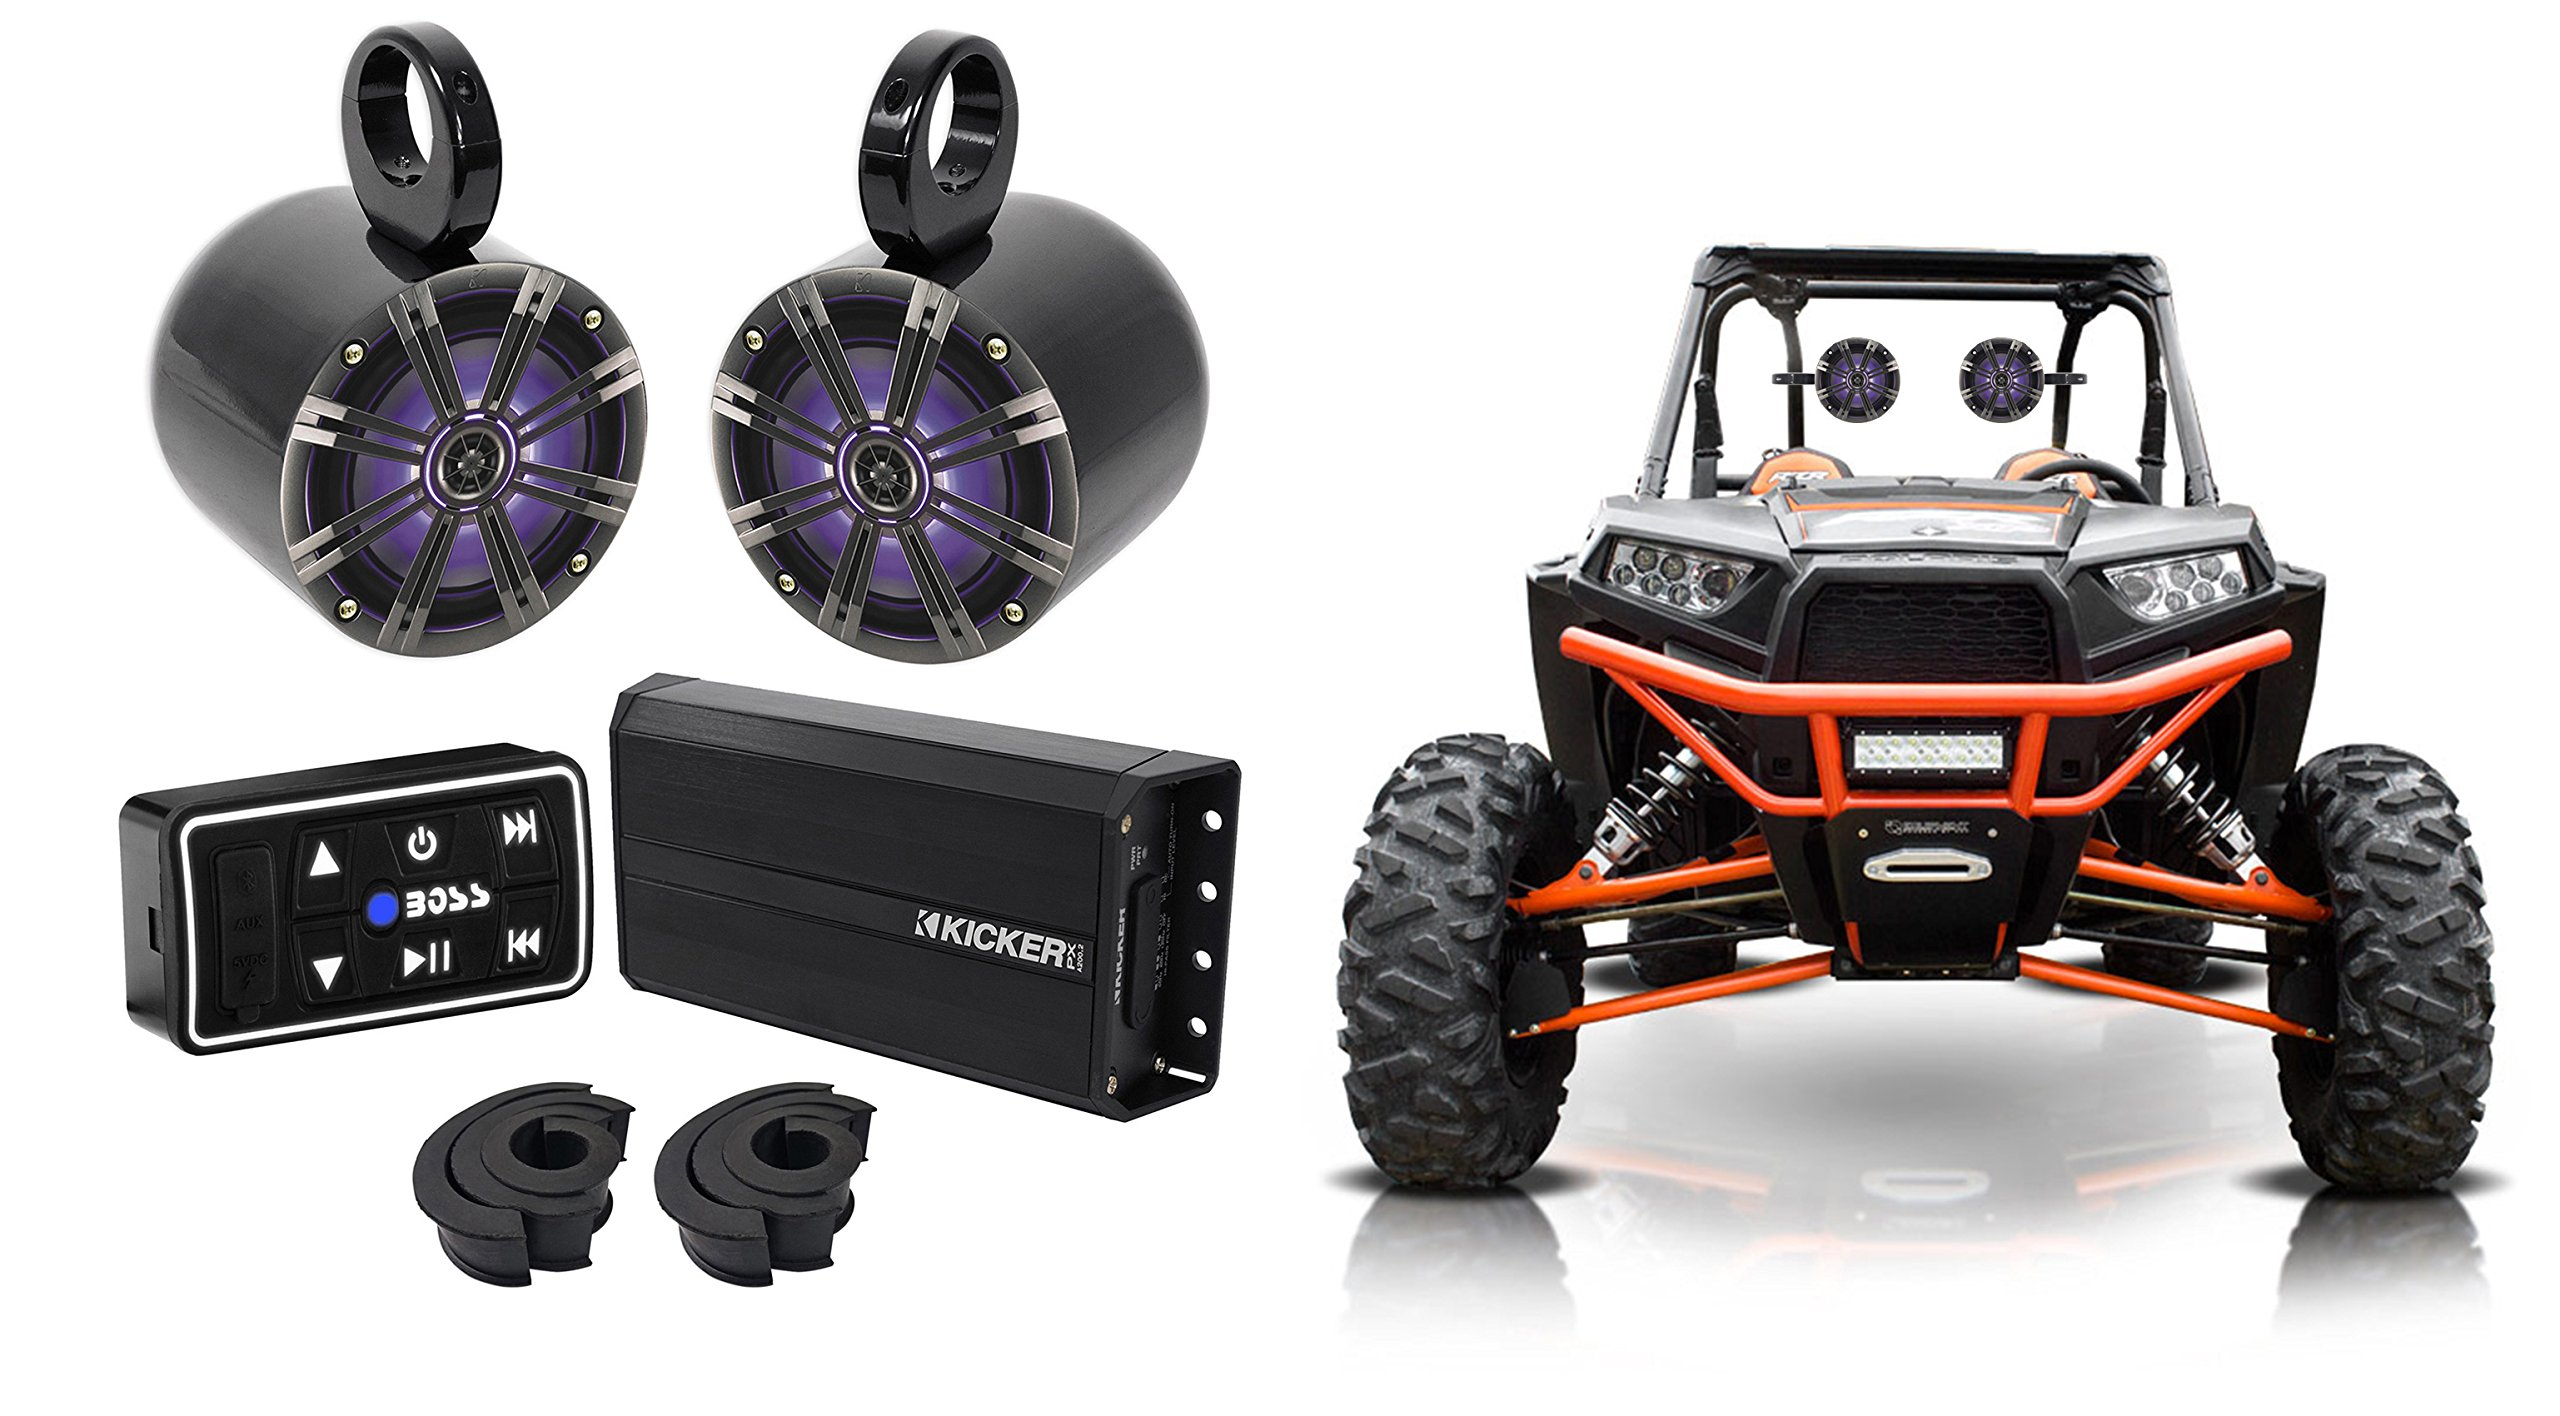 2 Kicker 6.5'' LED Tower Speakers+Kicker Amp+Bluetooth Contol Polaris RZR/ATV/UTV